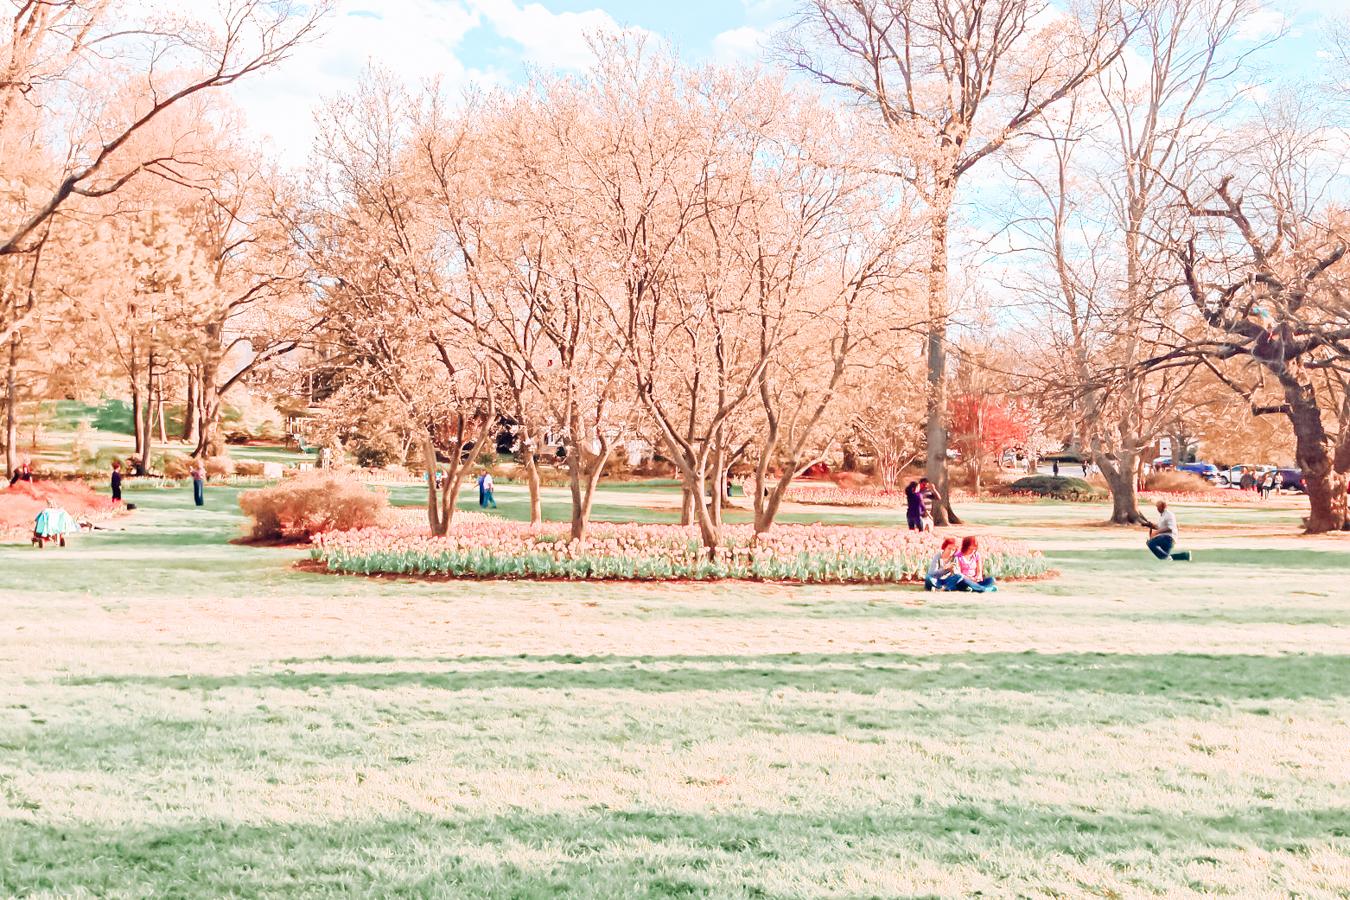 The Sherwood Gardens